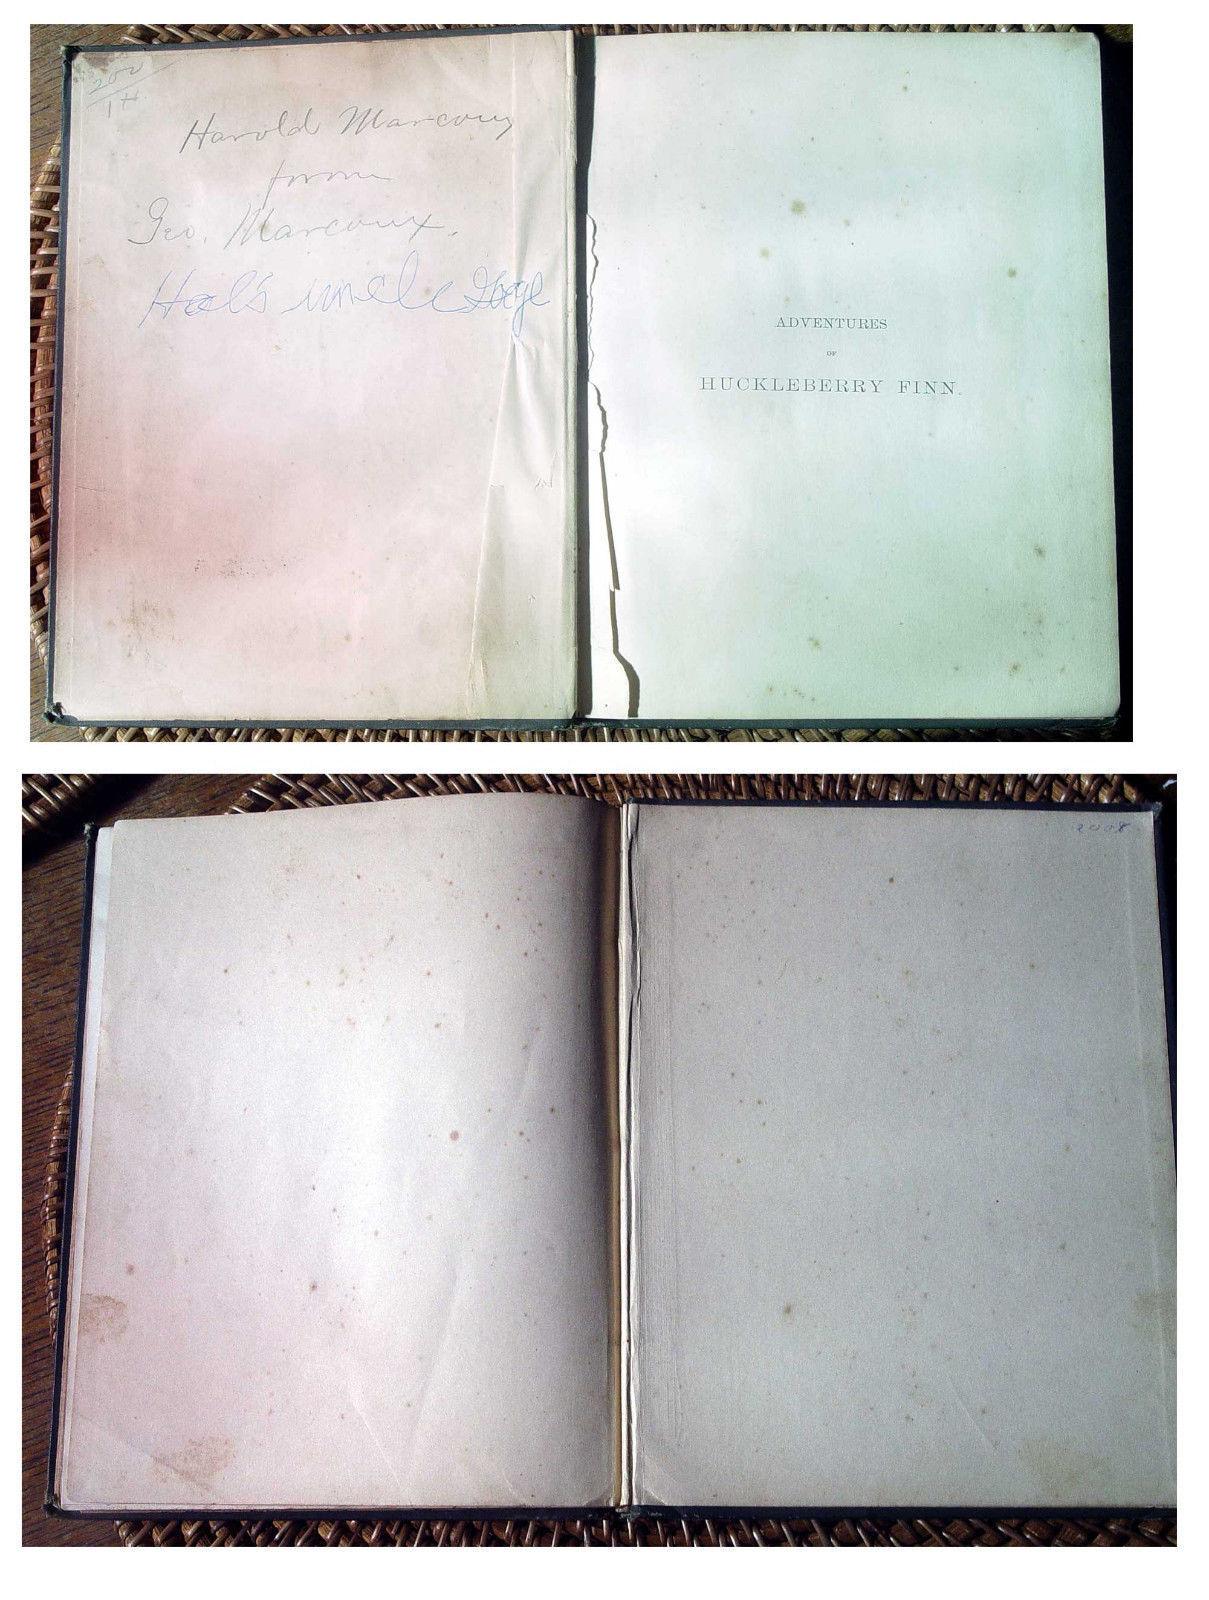 Mark Twain ADVENTURES OF HUCKLEBERRY FINN salesmen's sample